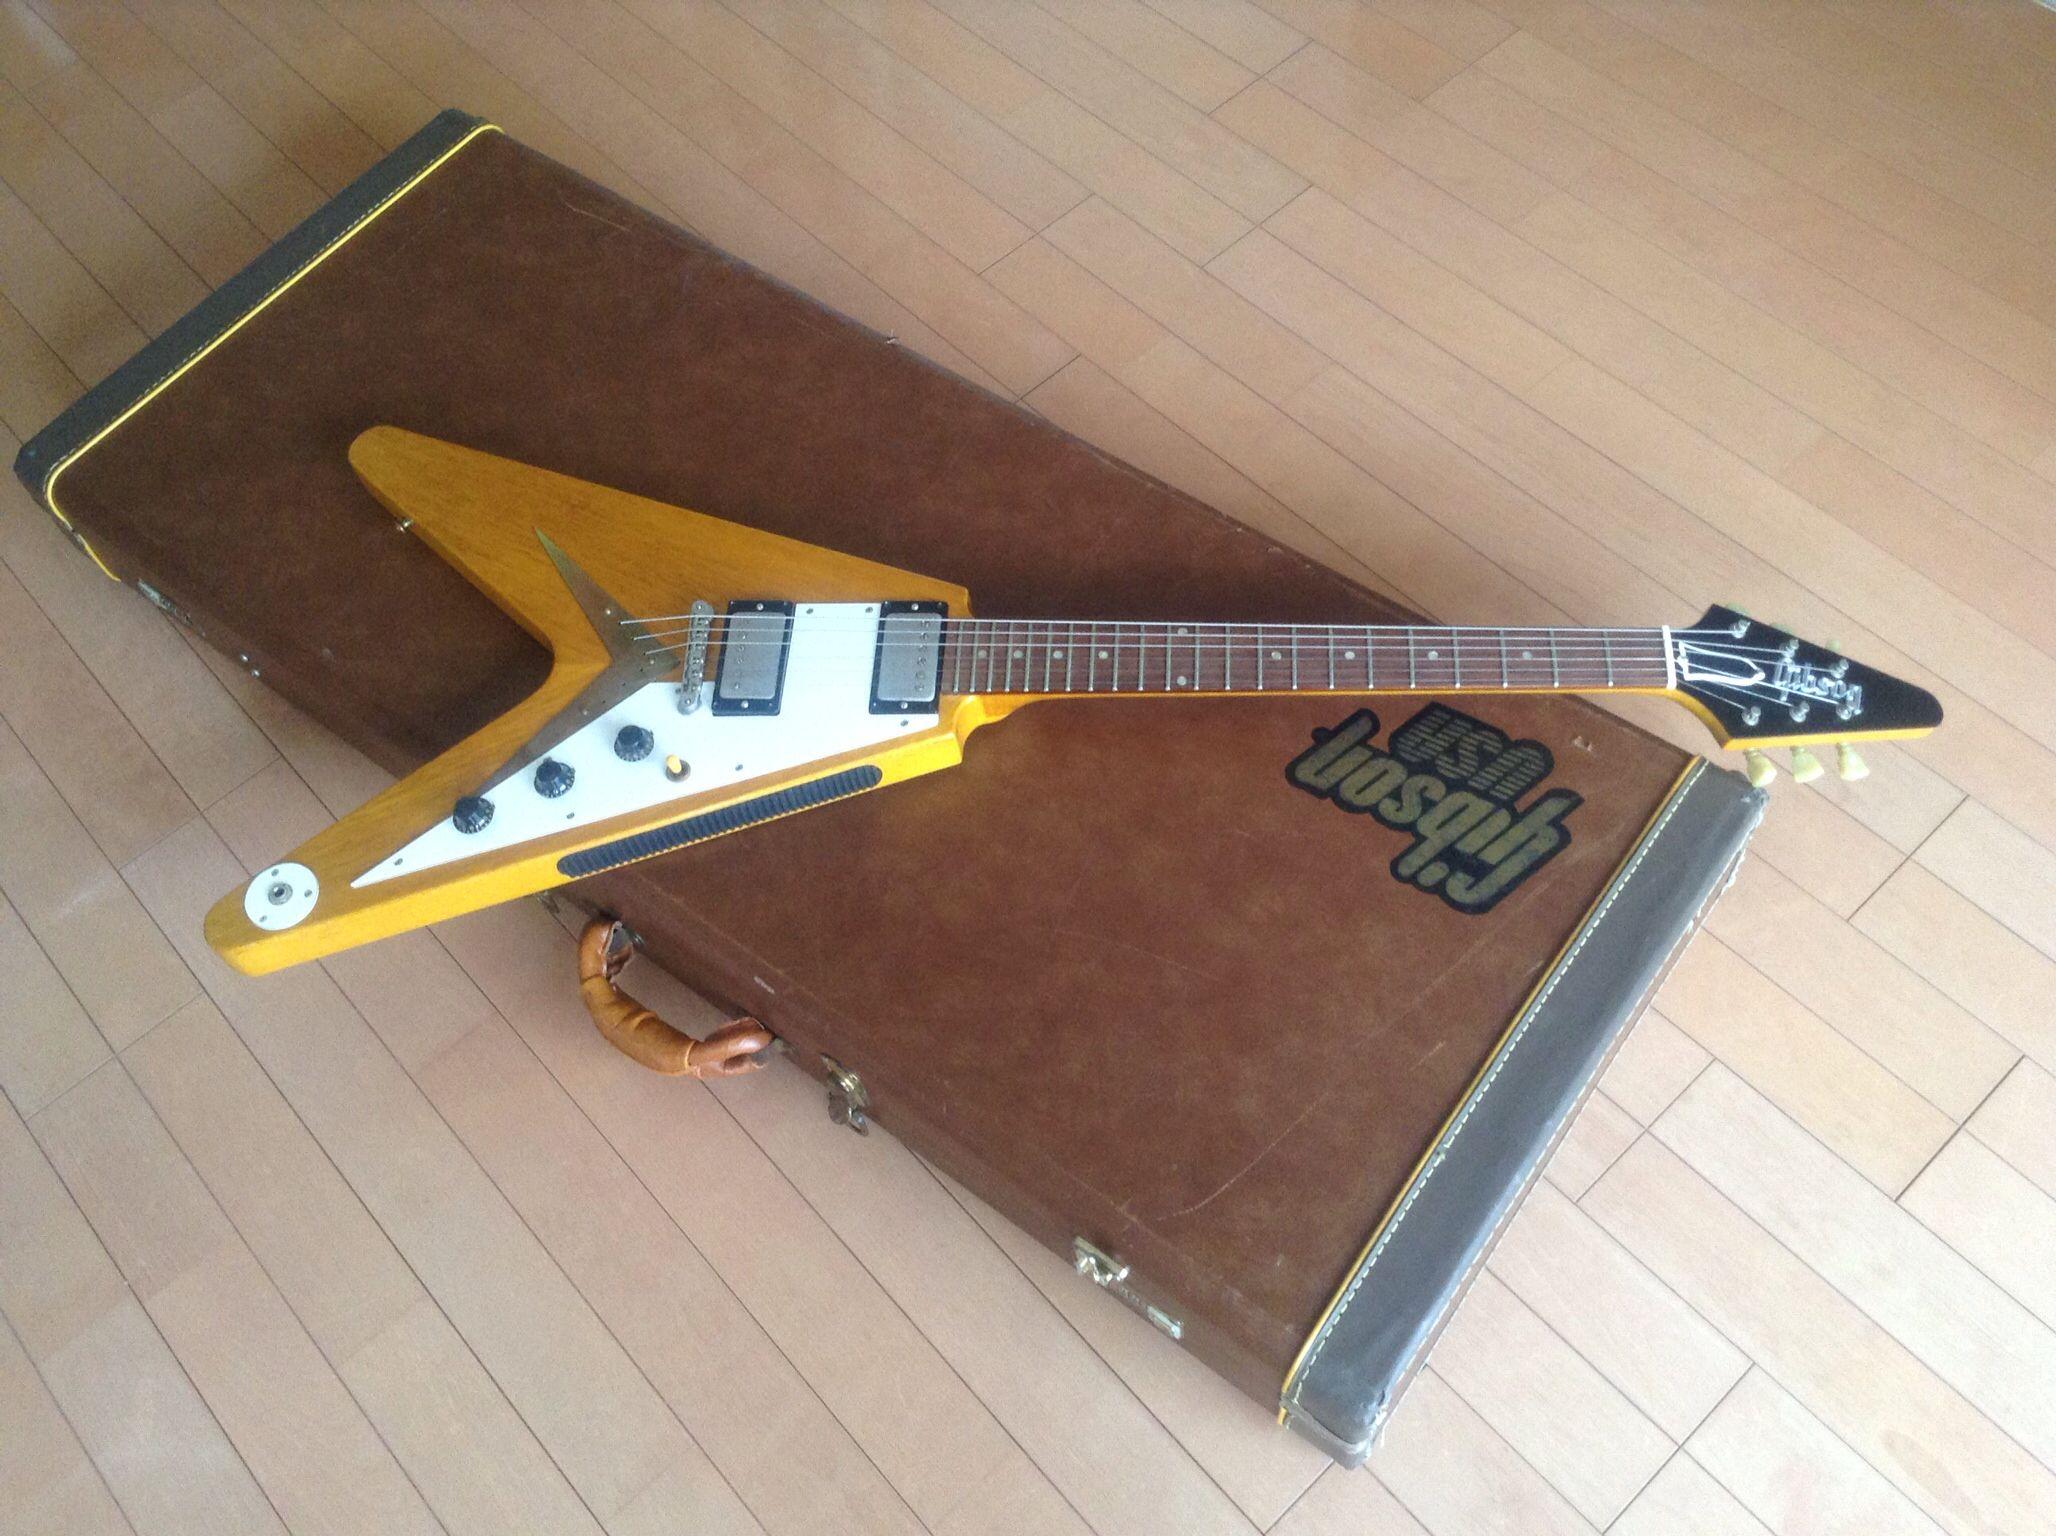 '58 Gibson FlyingV Replica